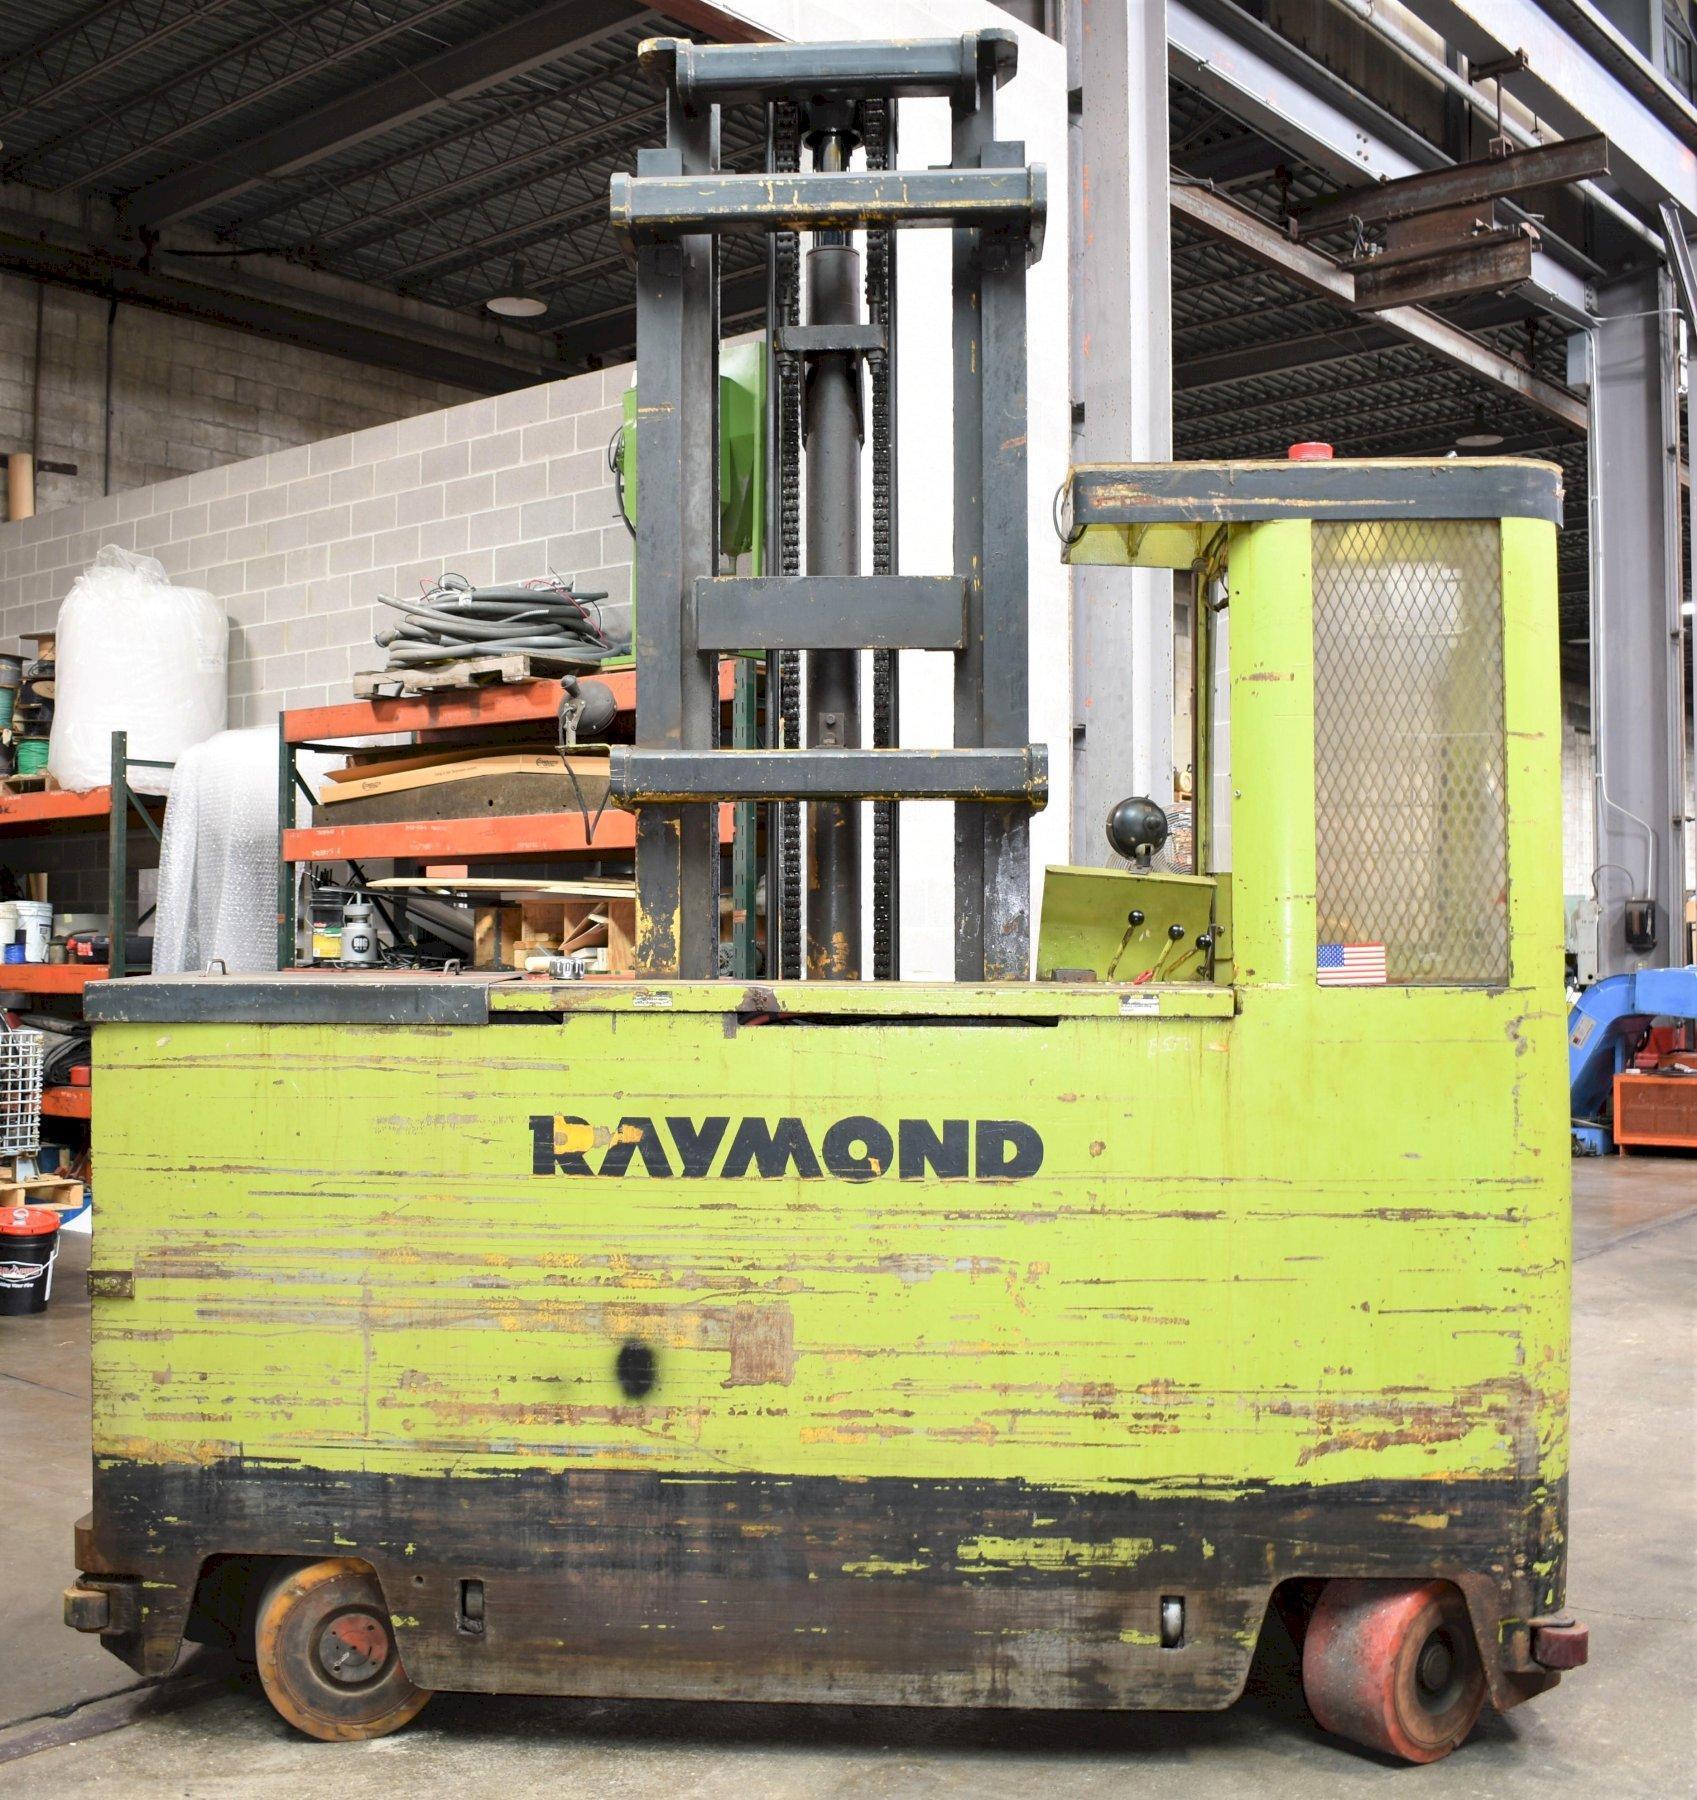 "10,000lb Raymond Side Loading Forklift, model: 75-SL100TN, 2 Stage Mast, 240"" Max Lift Height, 37"" Forks, 36 V Battery."